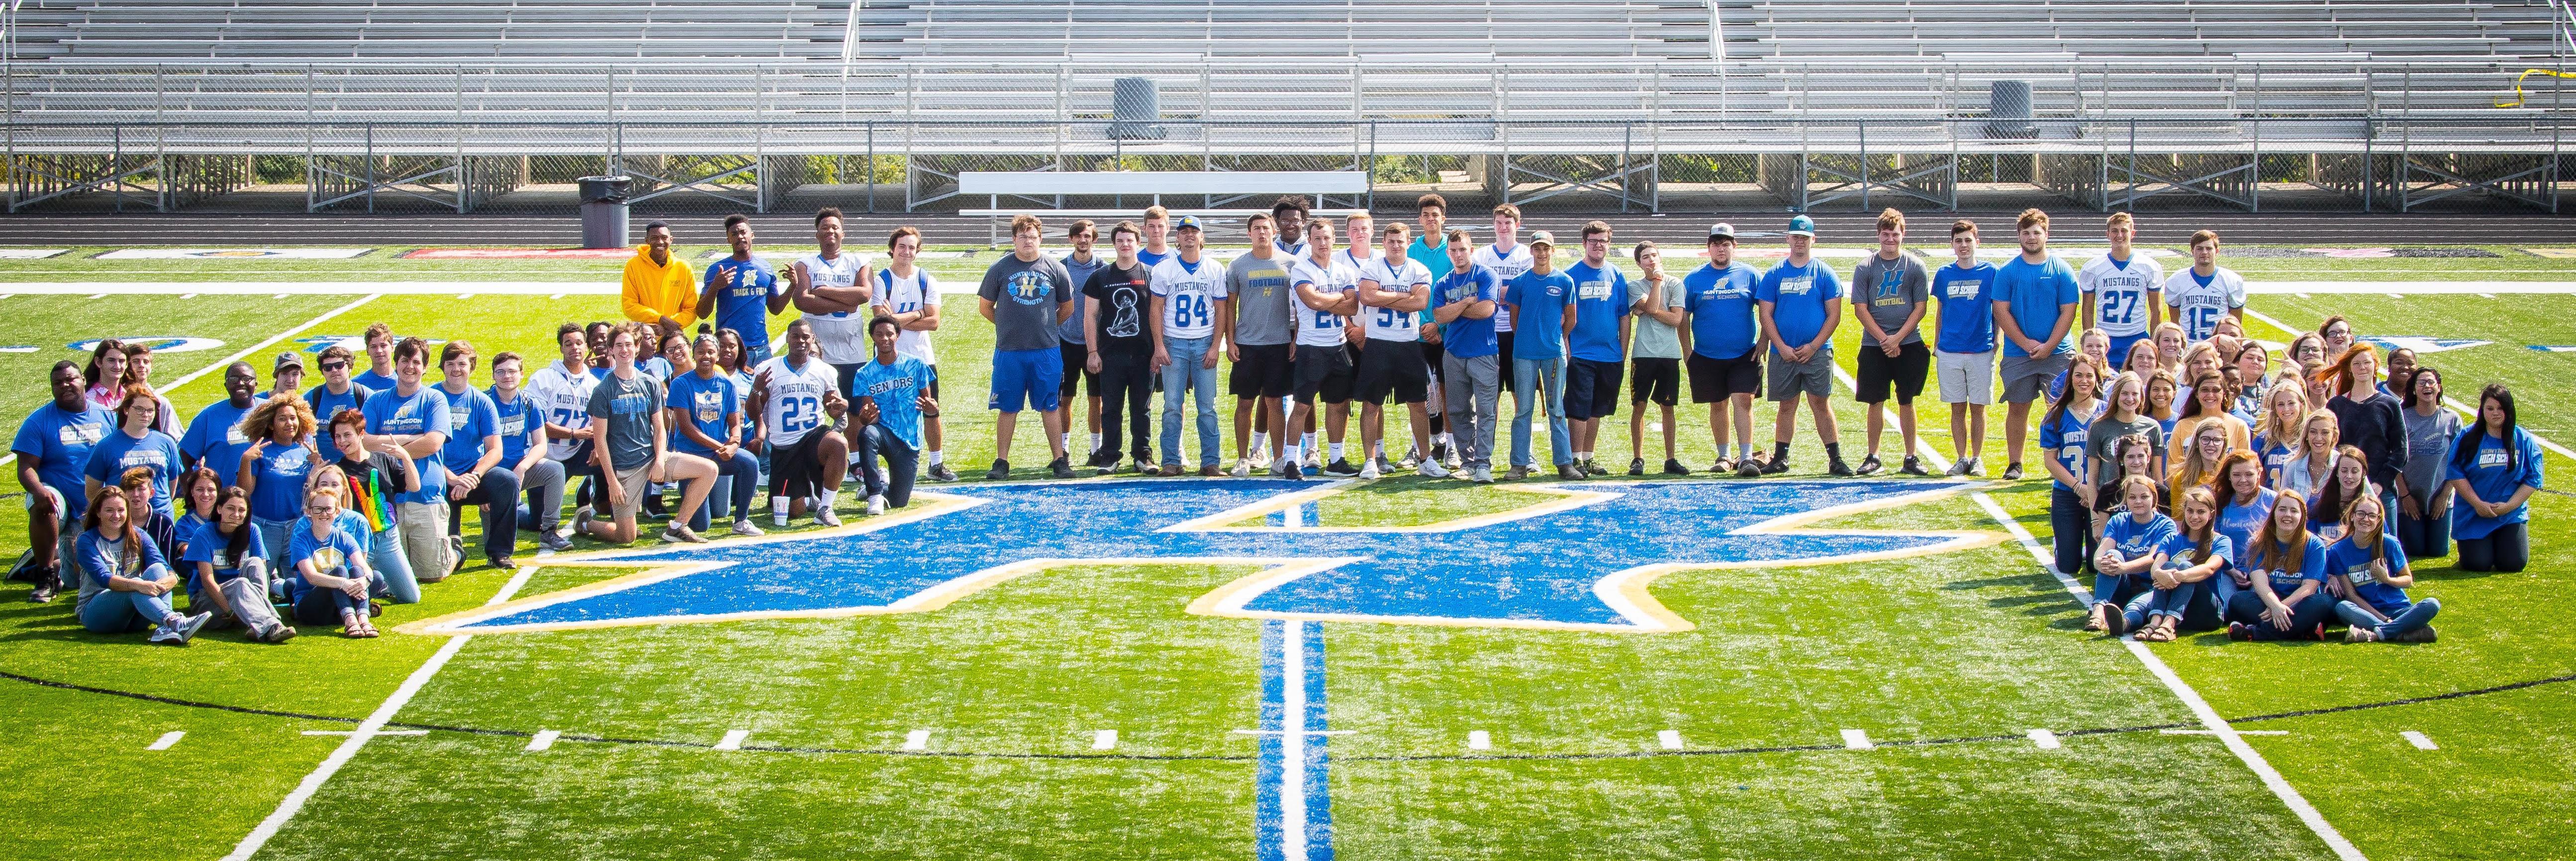 Seniors on football field